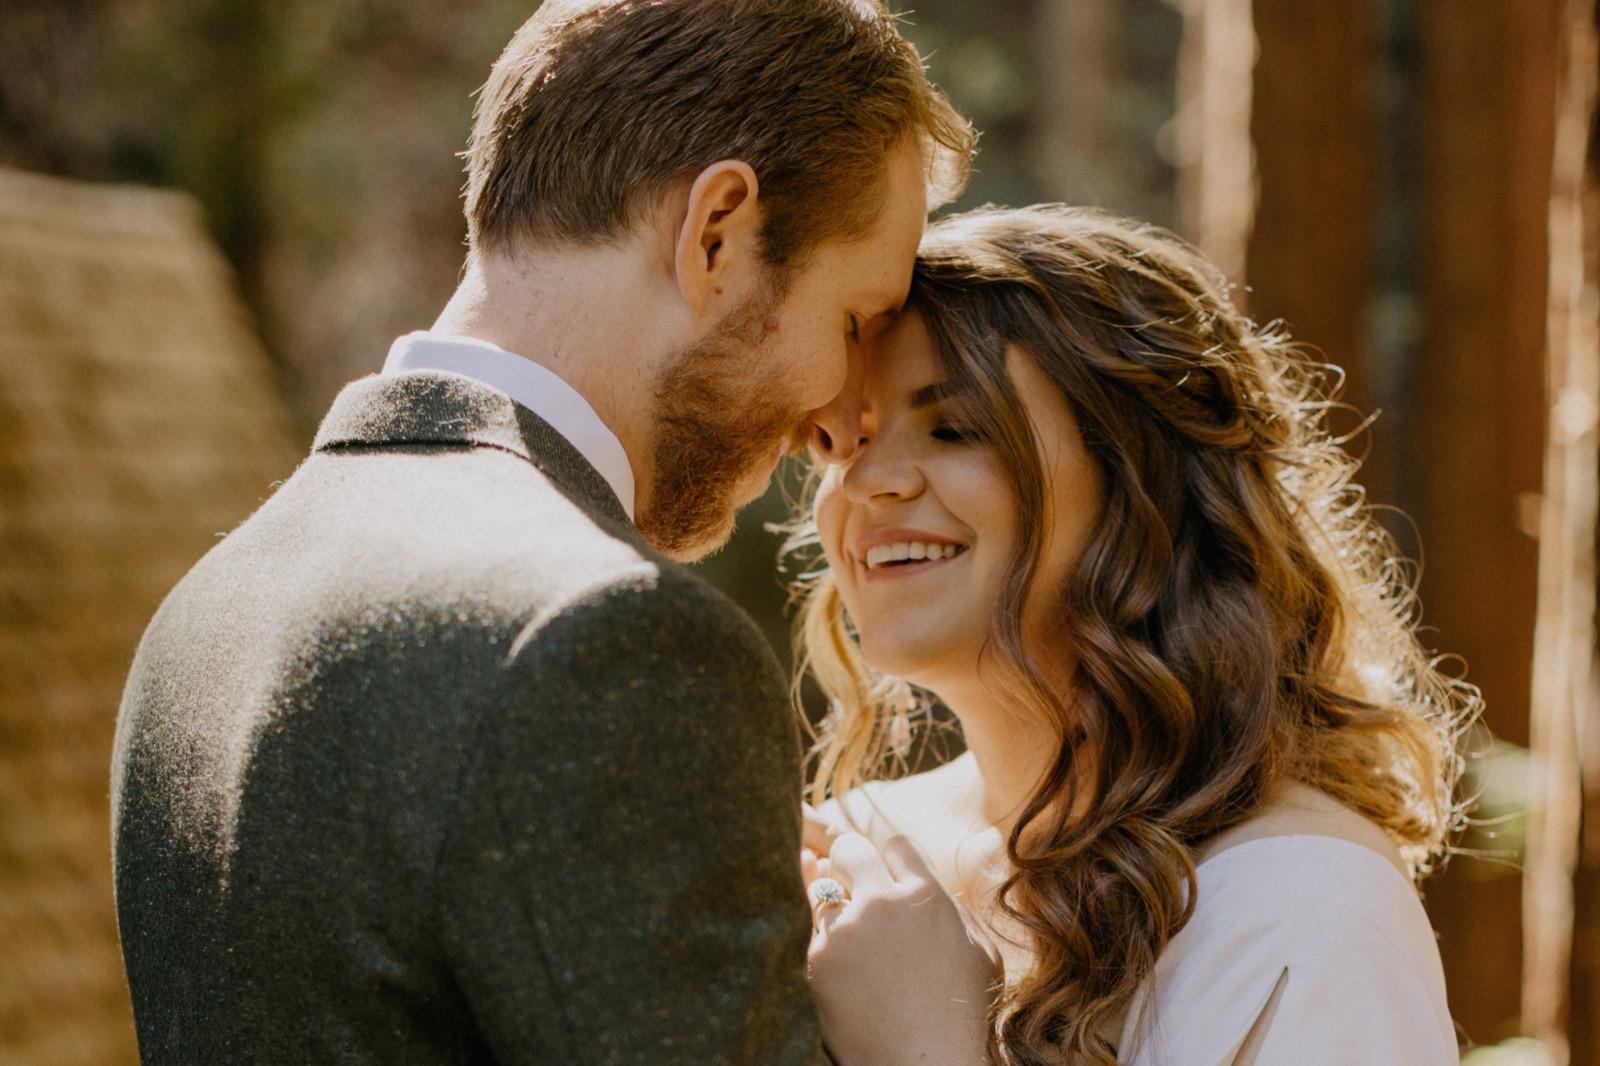 030_Emily & Jeff Wedding 0242_forest_bride_outdoor_first-look_moments_groom_wedding